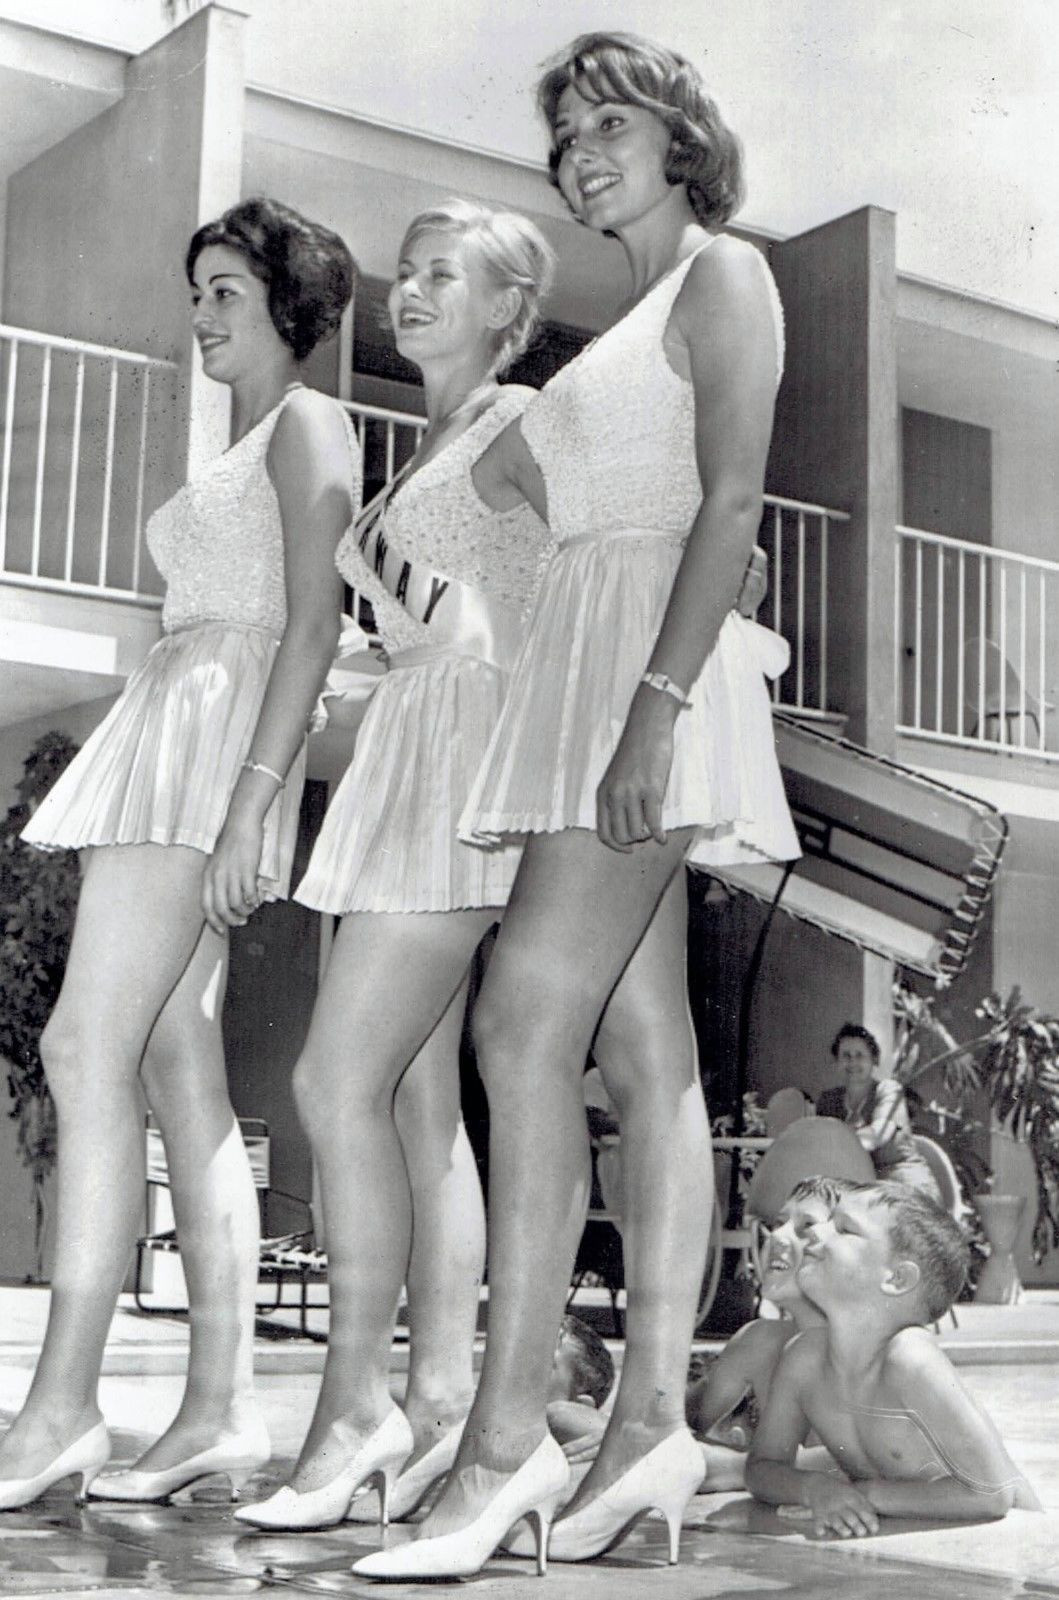 Three Boys And Three Beauty Pageant Contestants - 1960